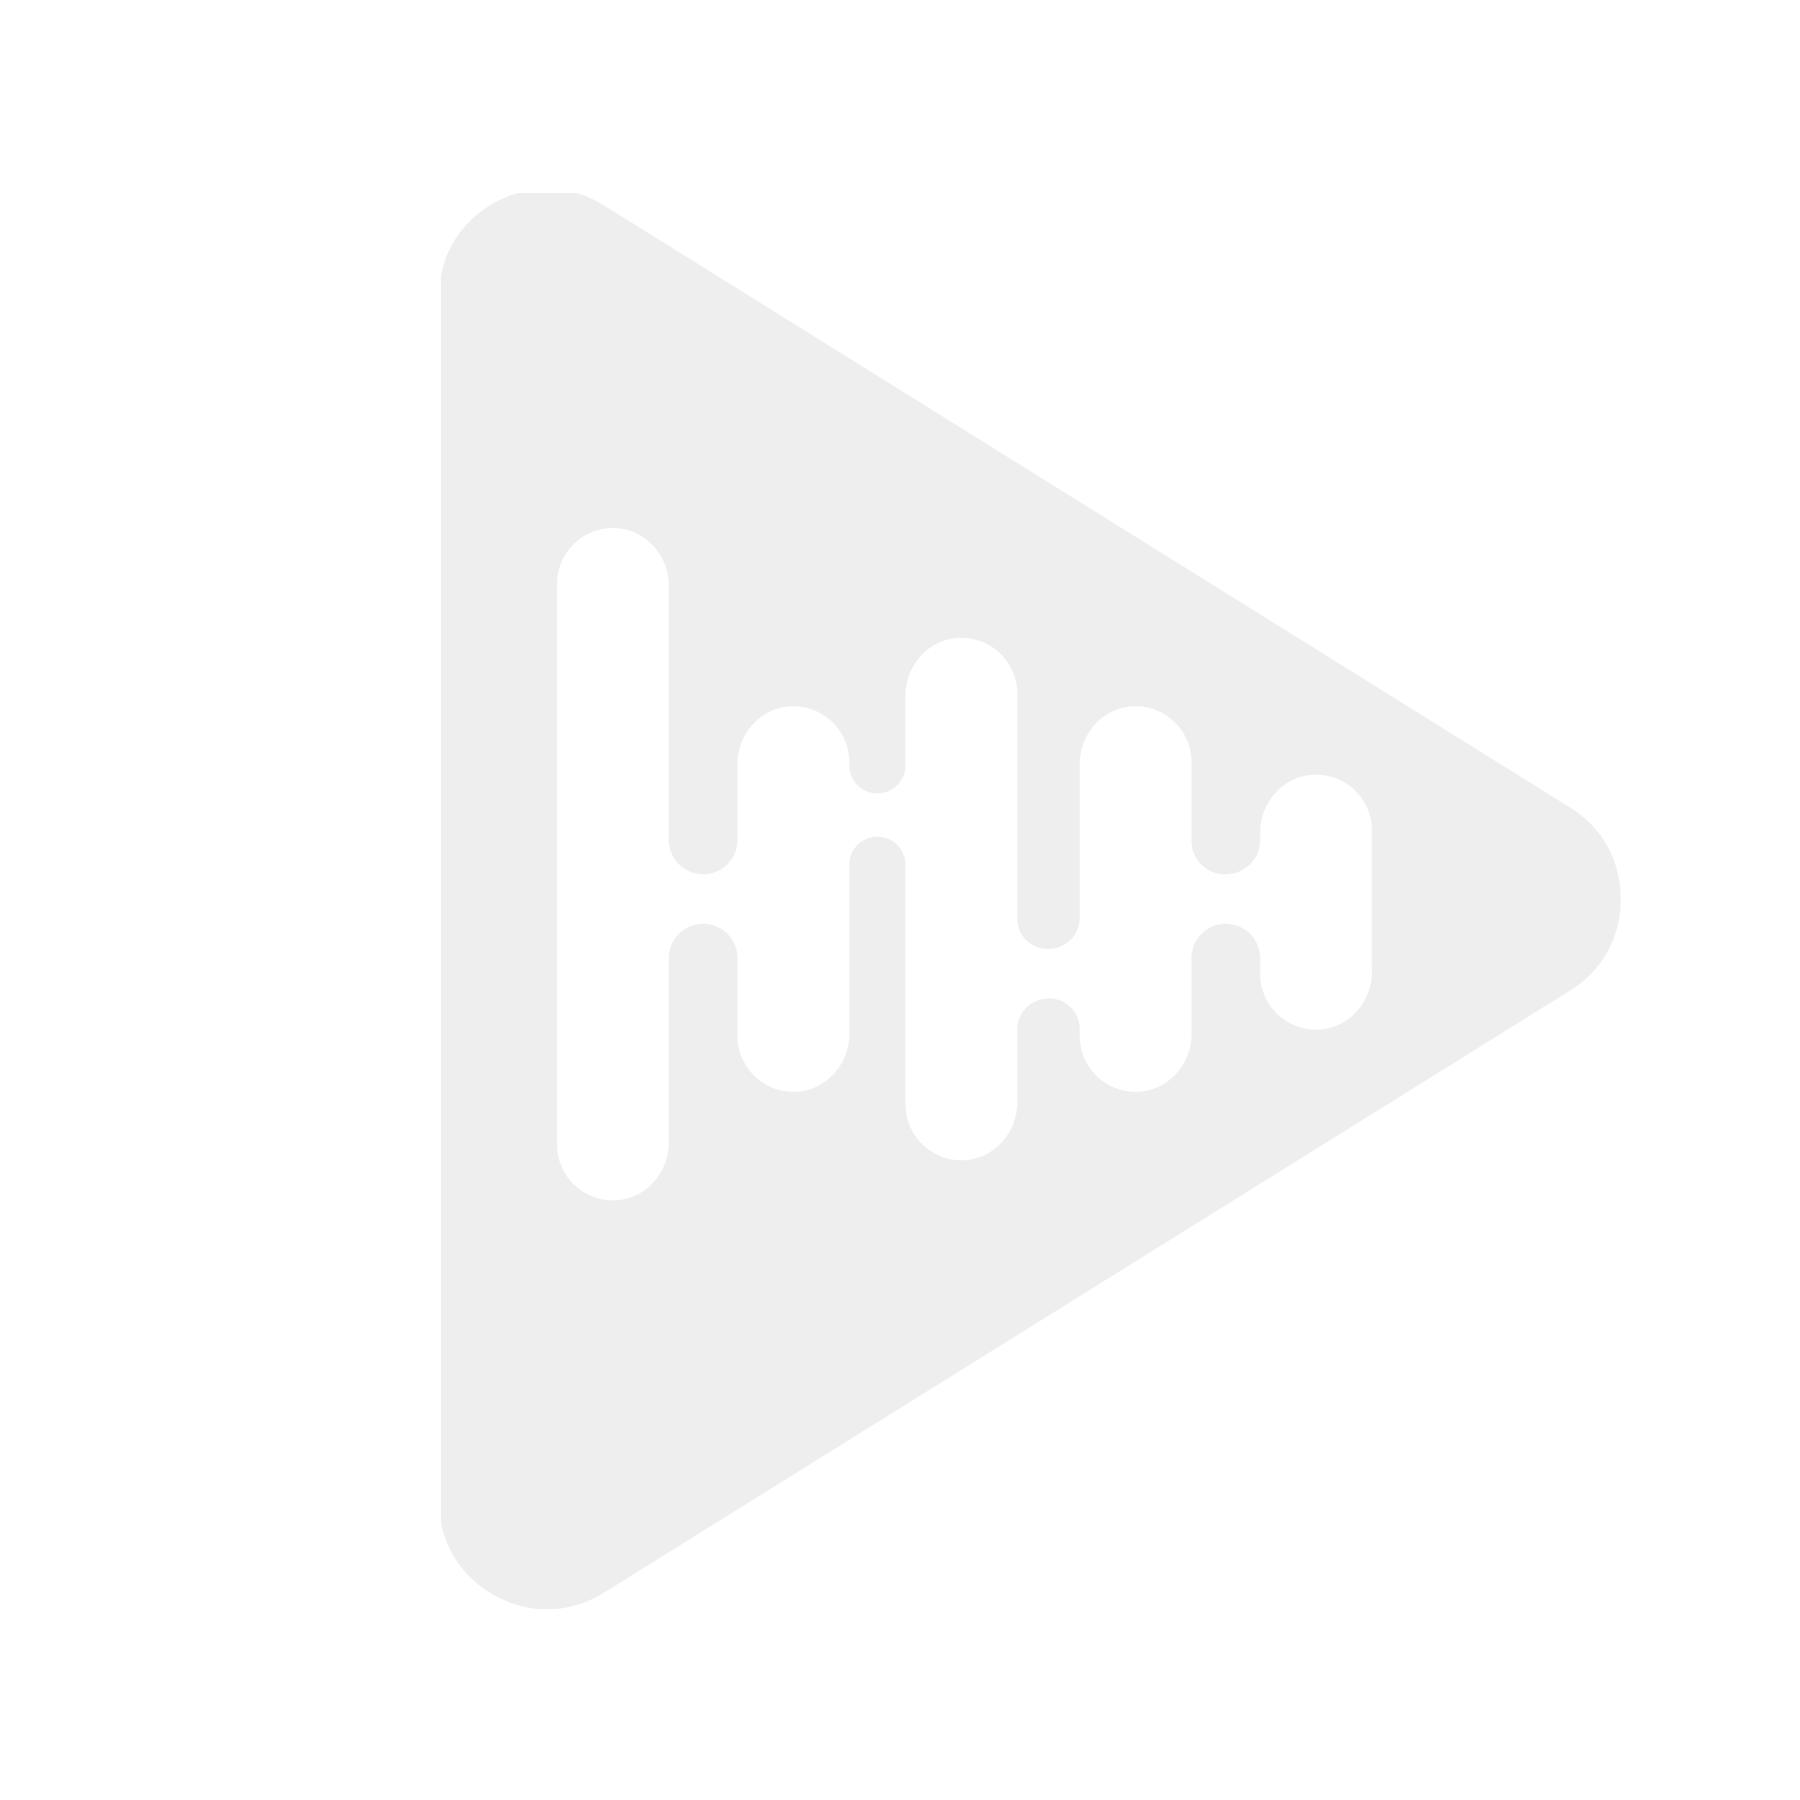 Audison AP F8.9 BIT-AUDI1